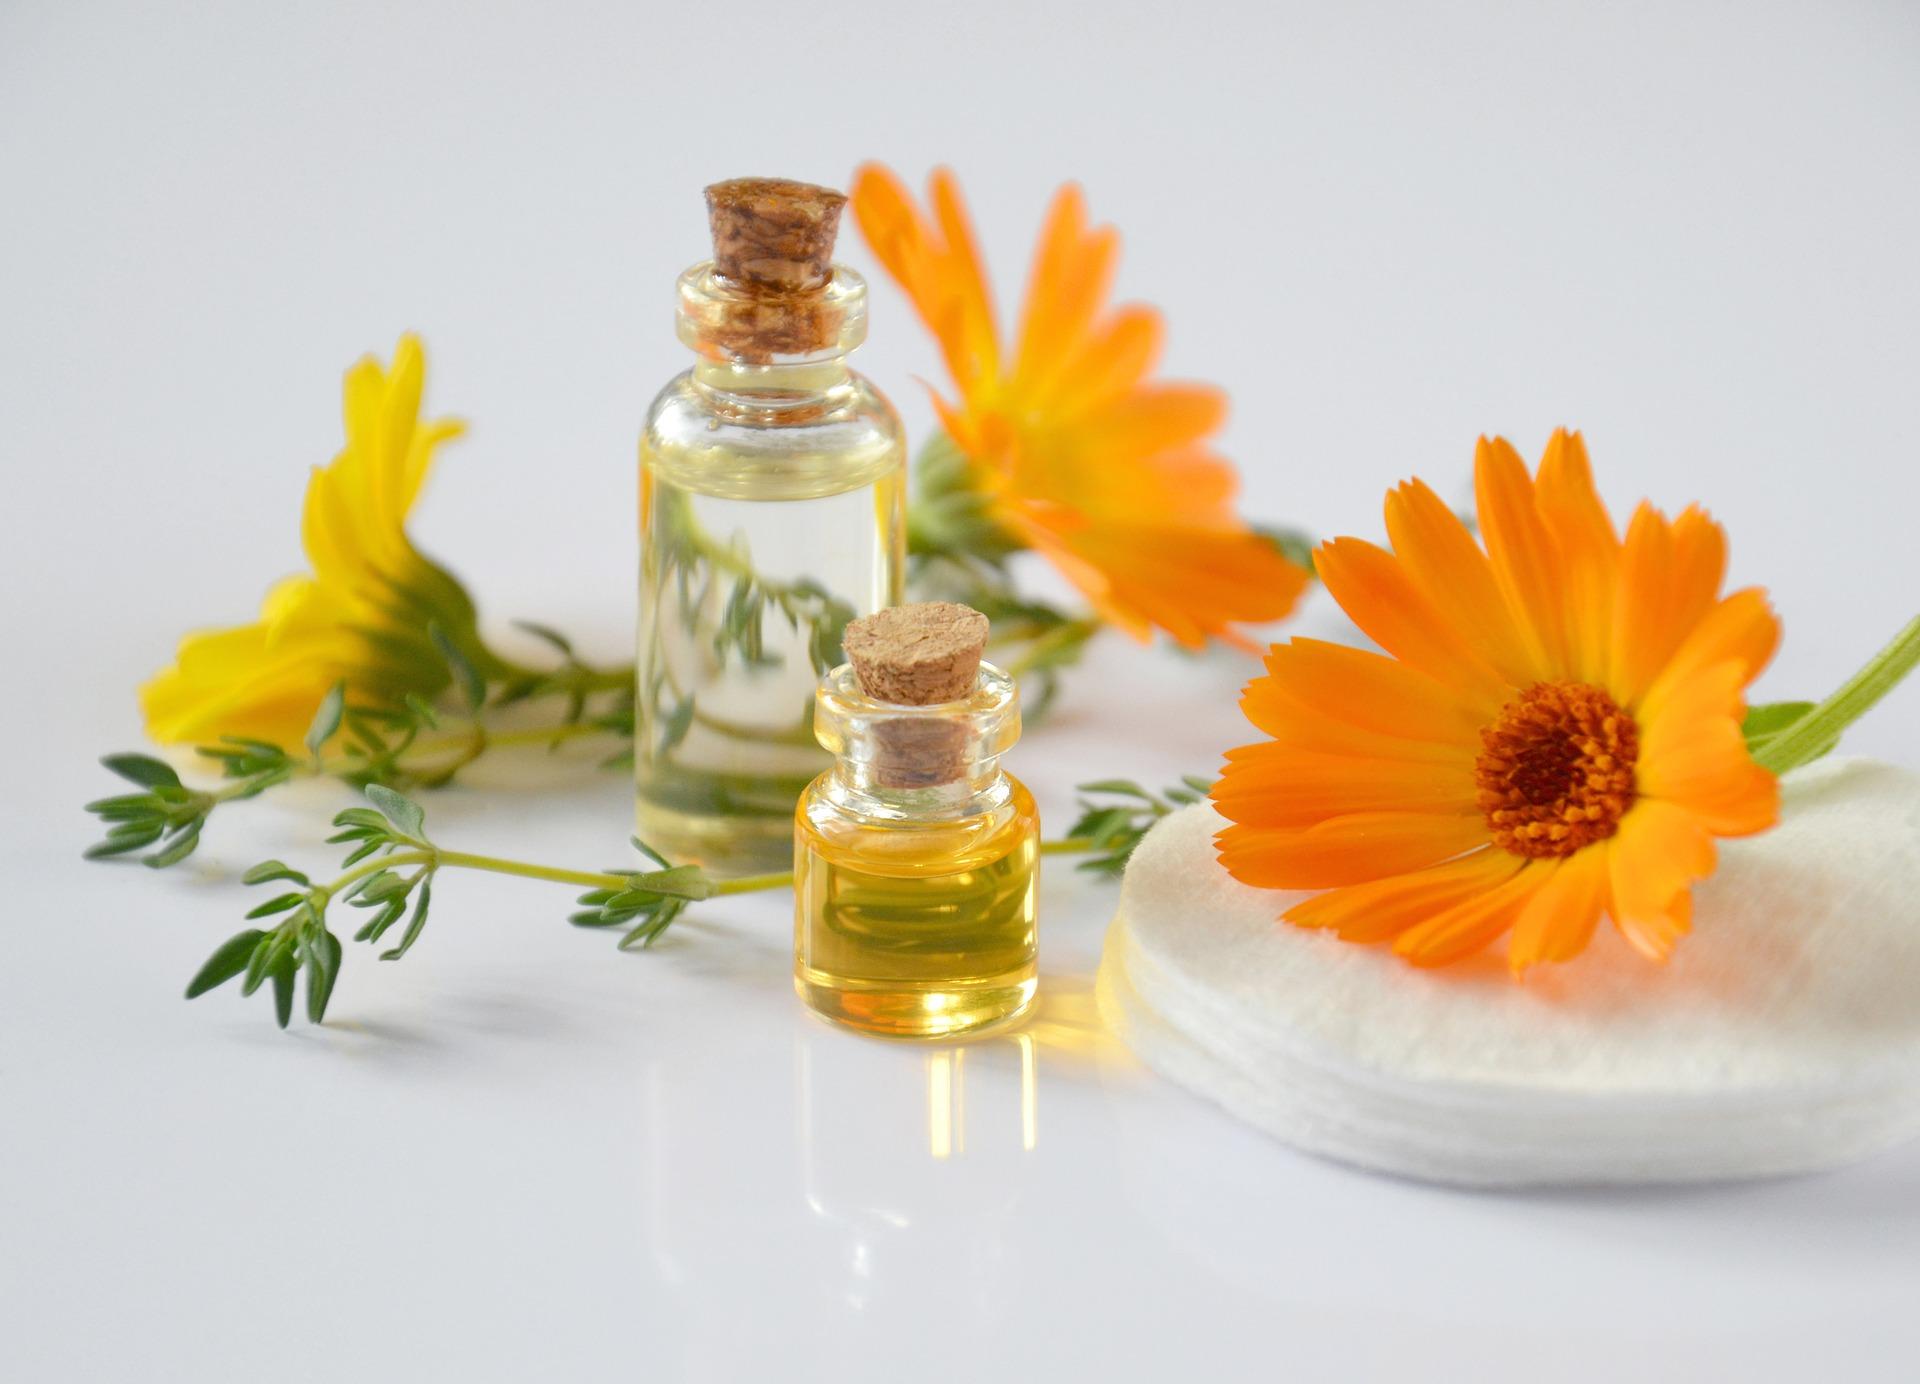 Terra roxa sàrl : Physalis huiles essentielles bio